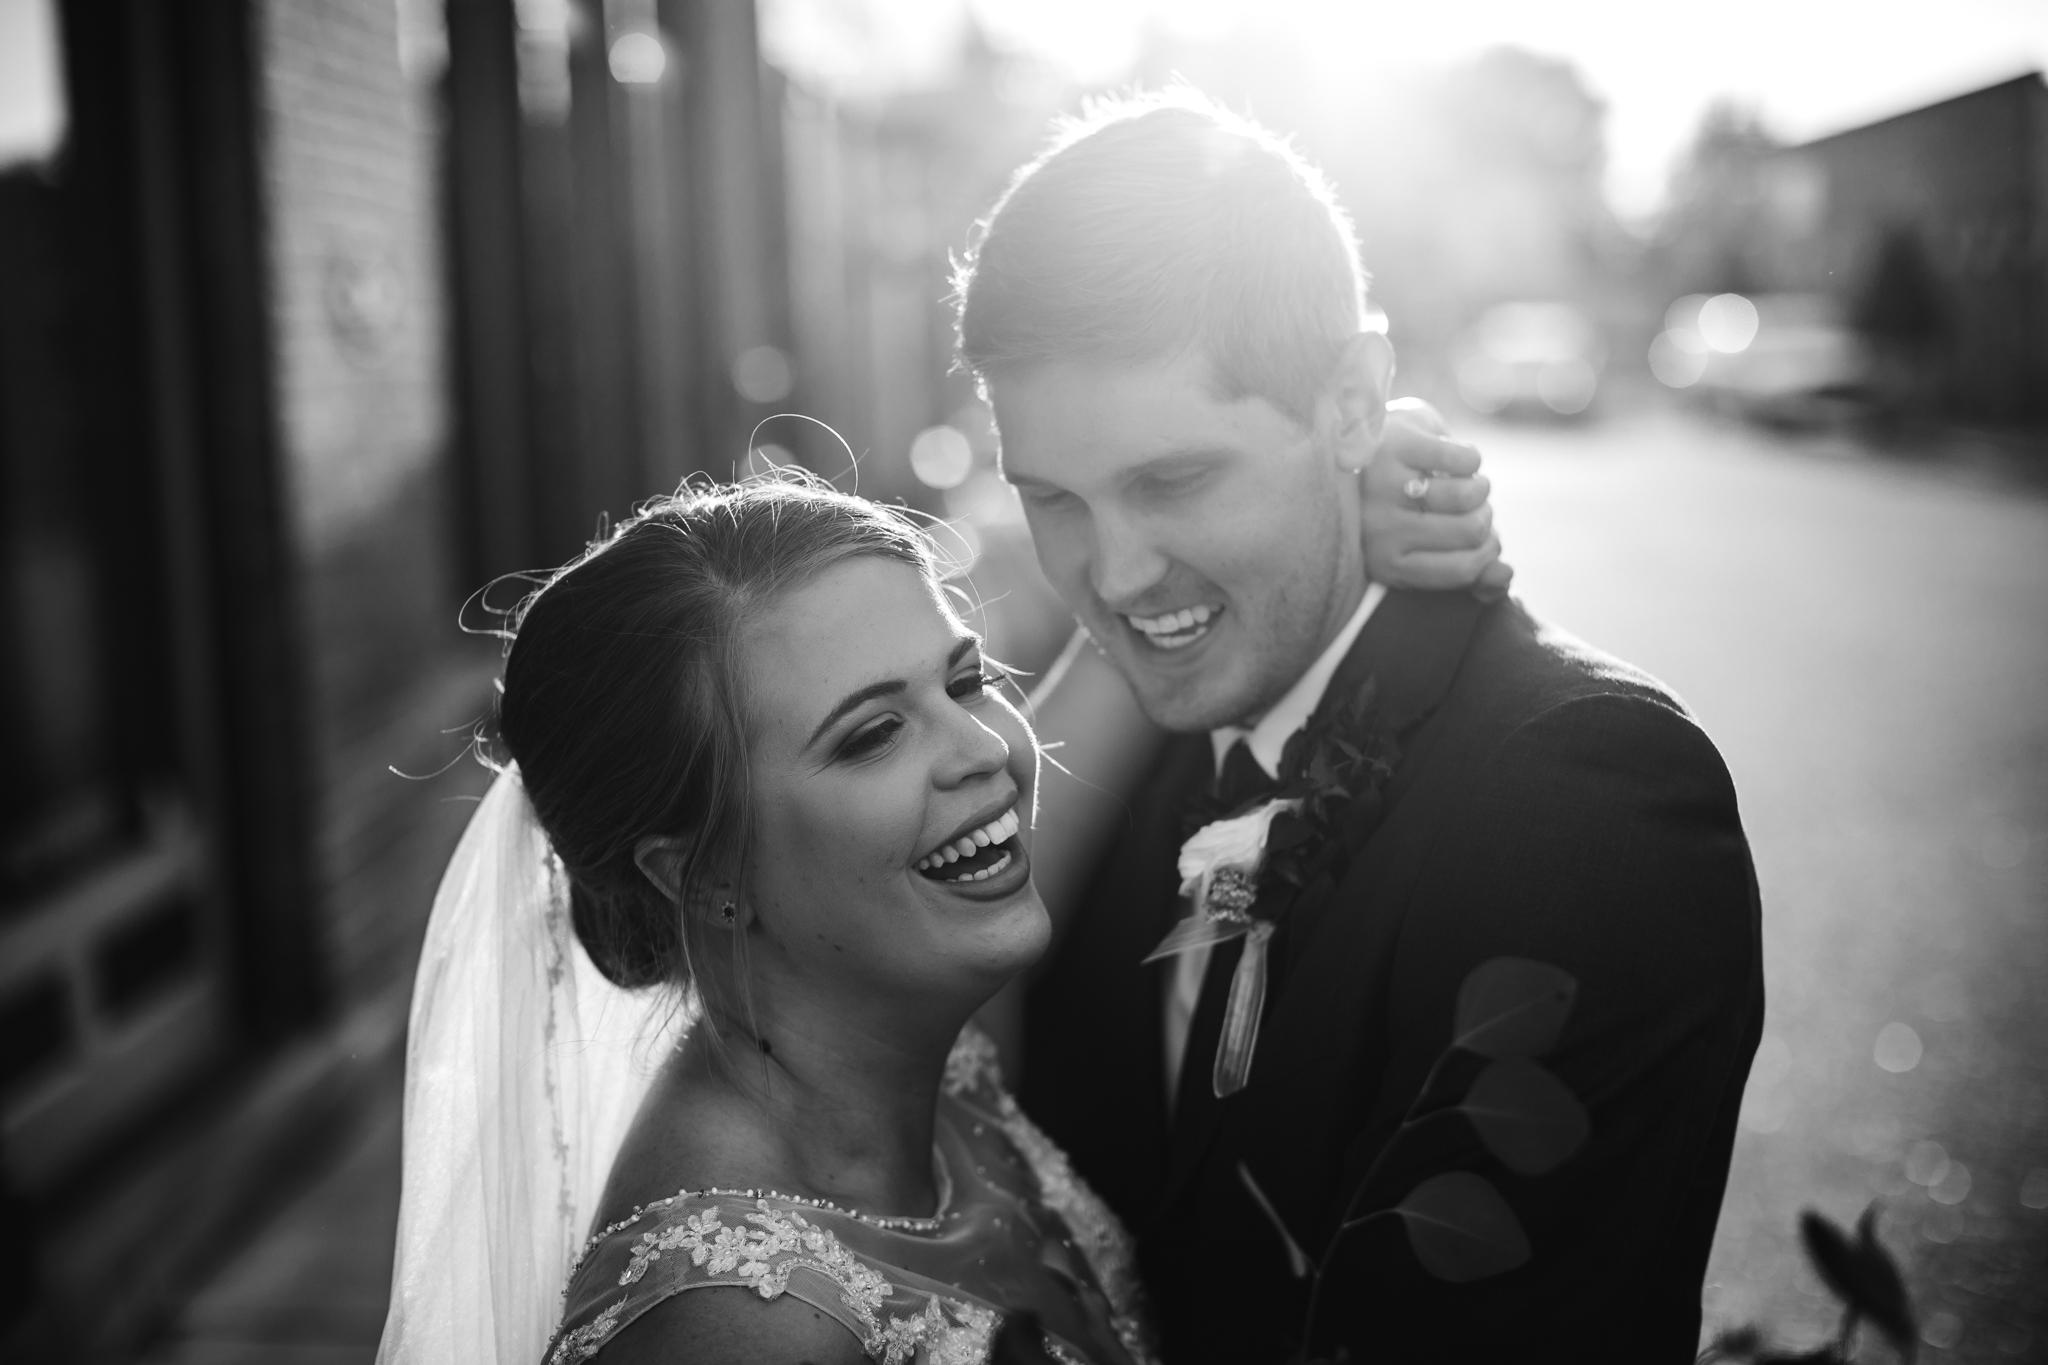 firstandgreen-grenada-ms-wedding-venue-thewarmtharoundyou-wedding-photographers (9 of 12).jpg